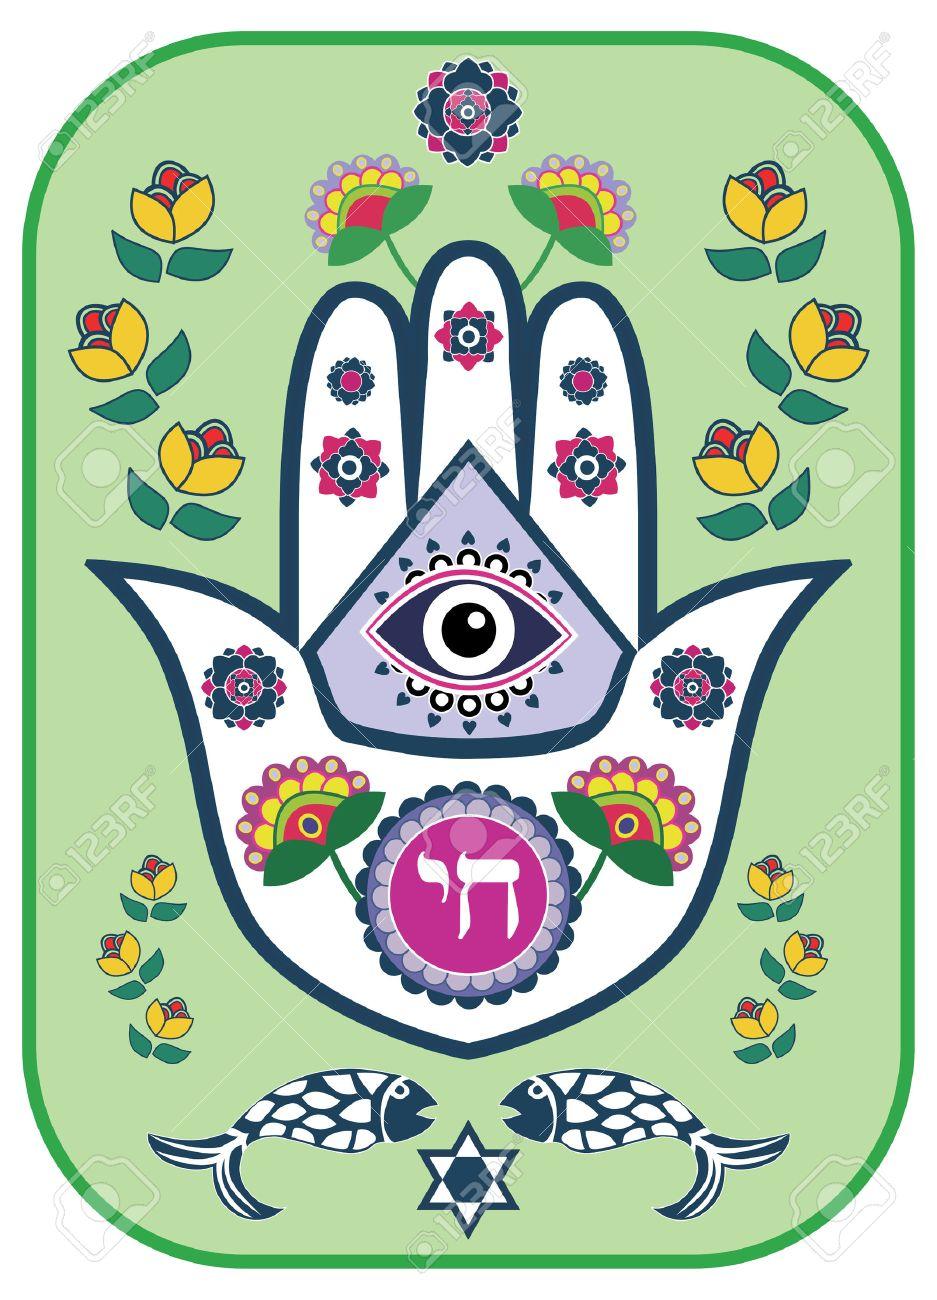 Jewish hamsa hand amulet or miriam hand royalty free cliparts jewish hamsa hand amulet or miriam hand stock vector 8590438 biocorpaavc